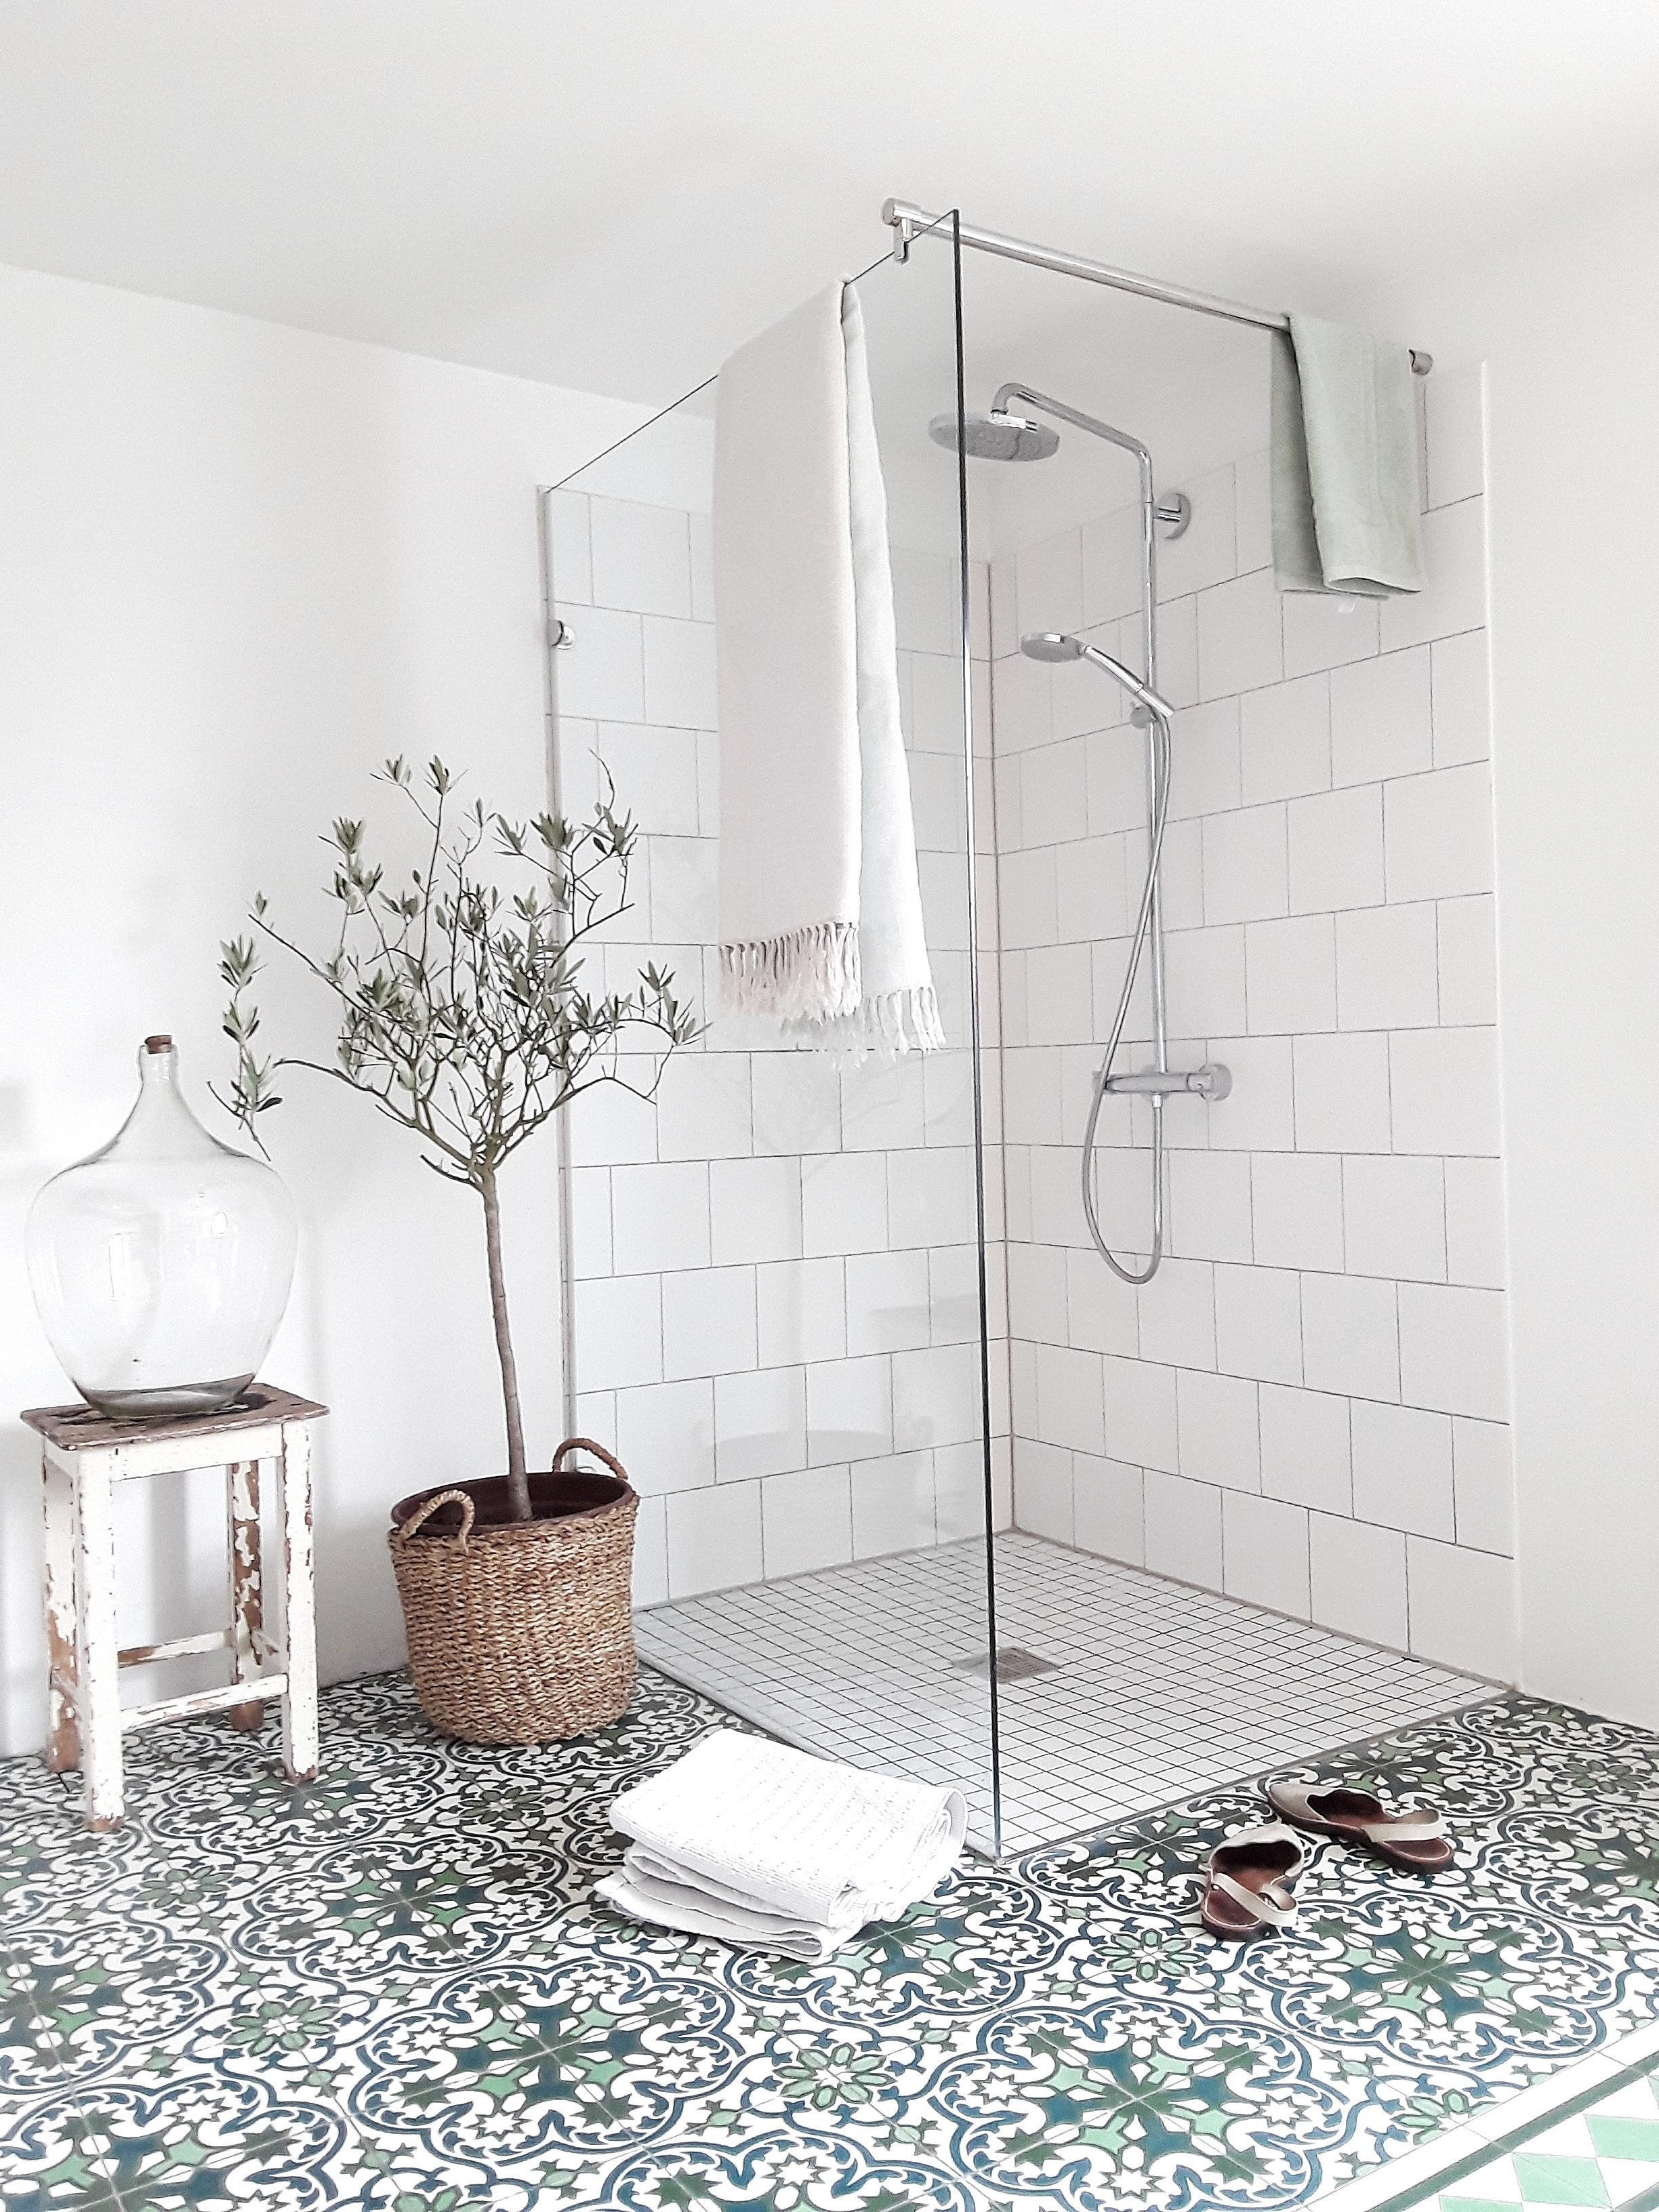 Dusche • Bilder & Ideen • COUCH